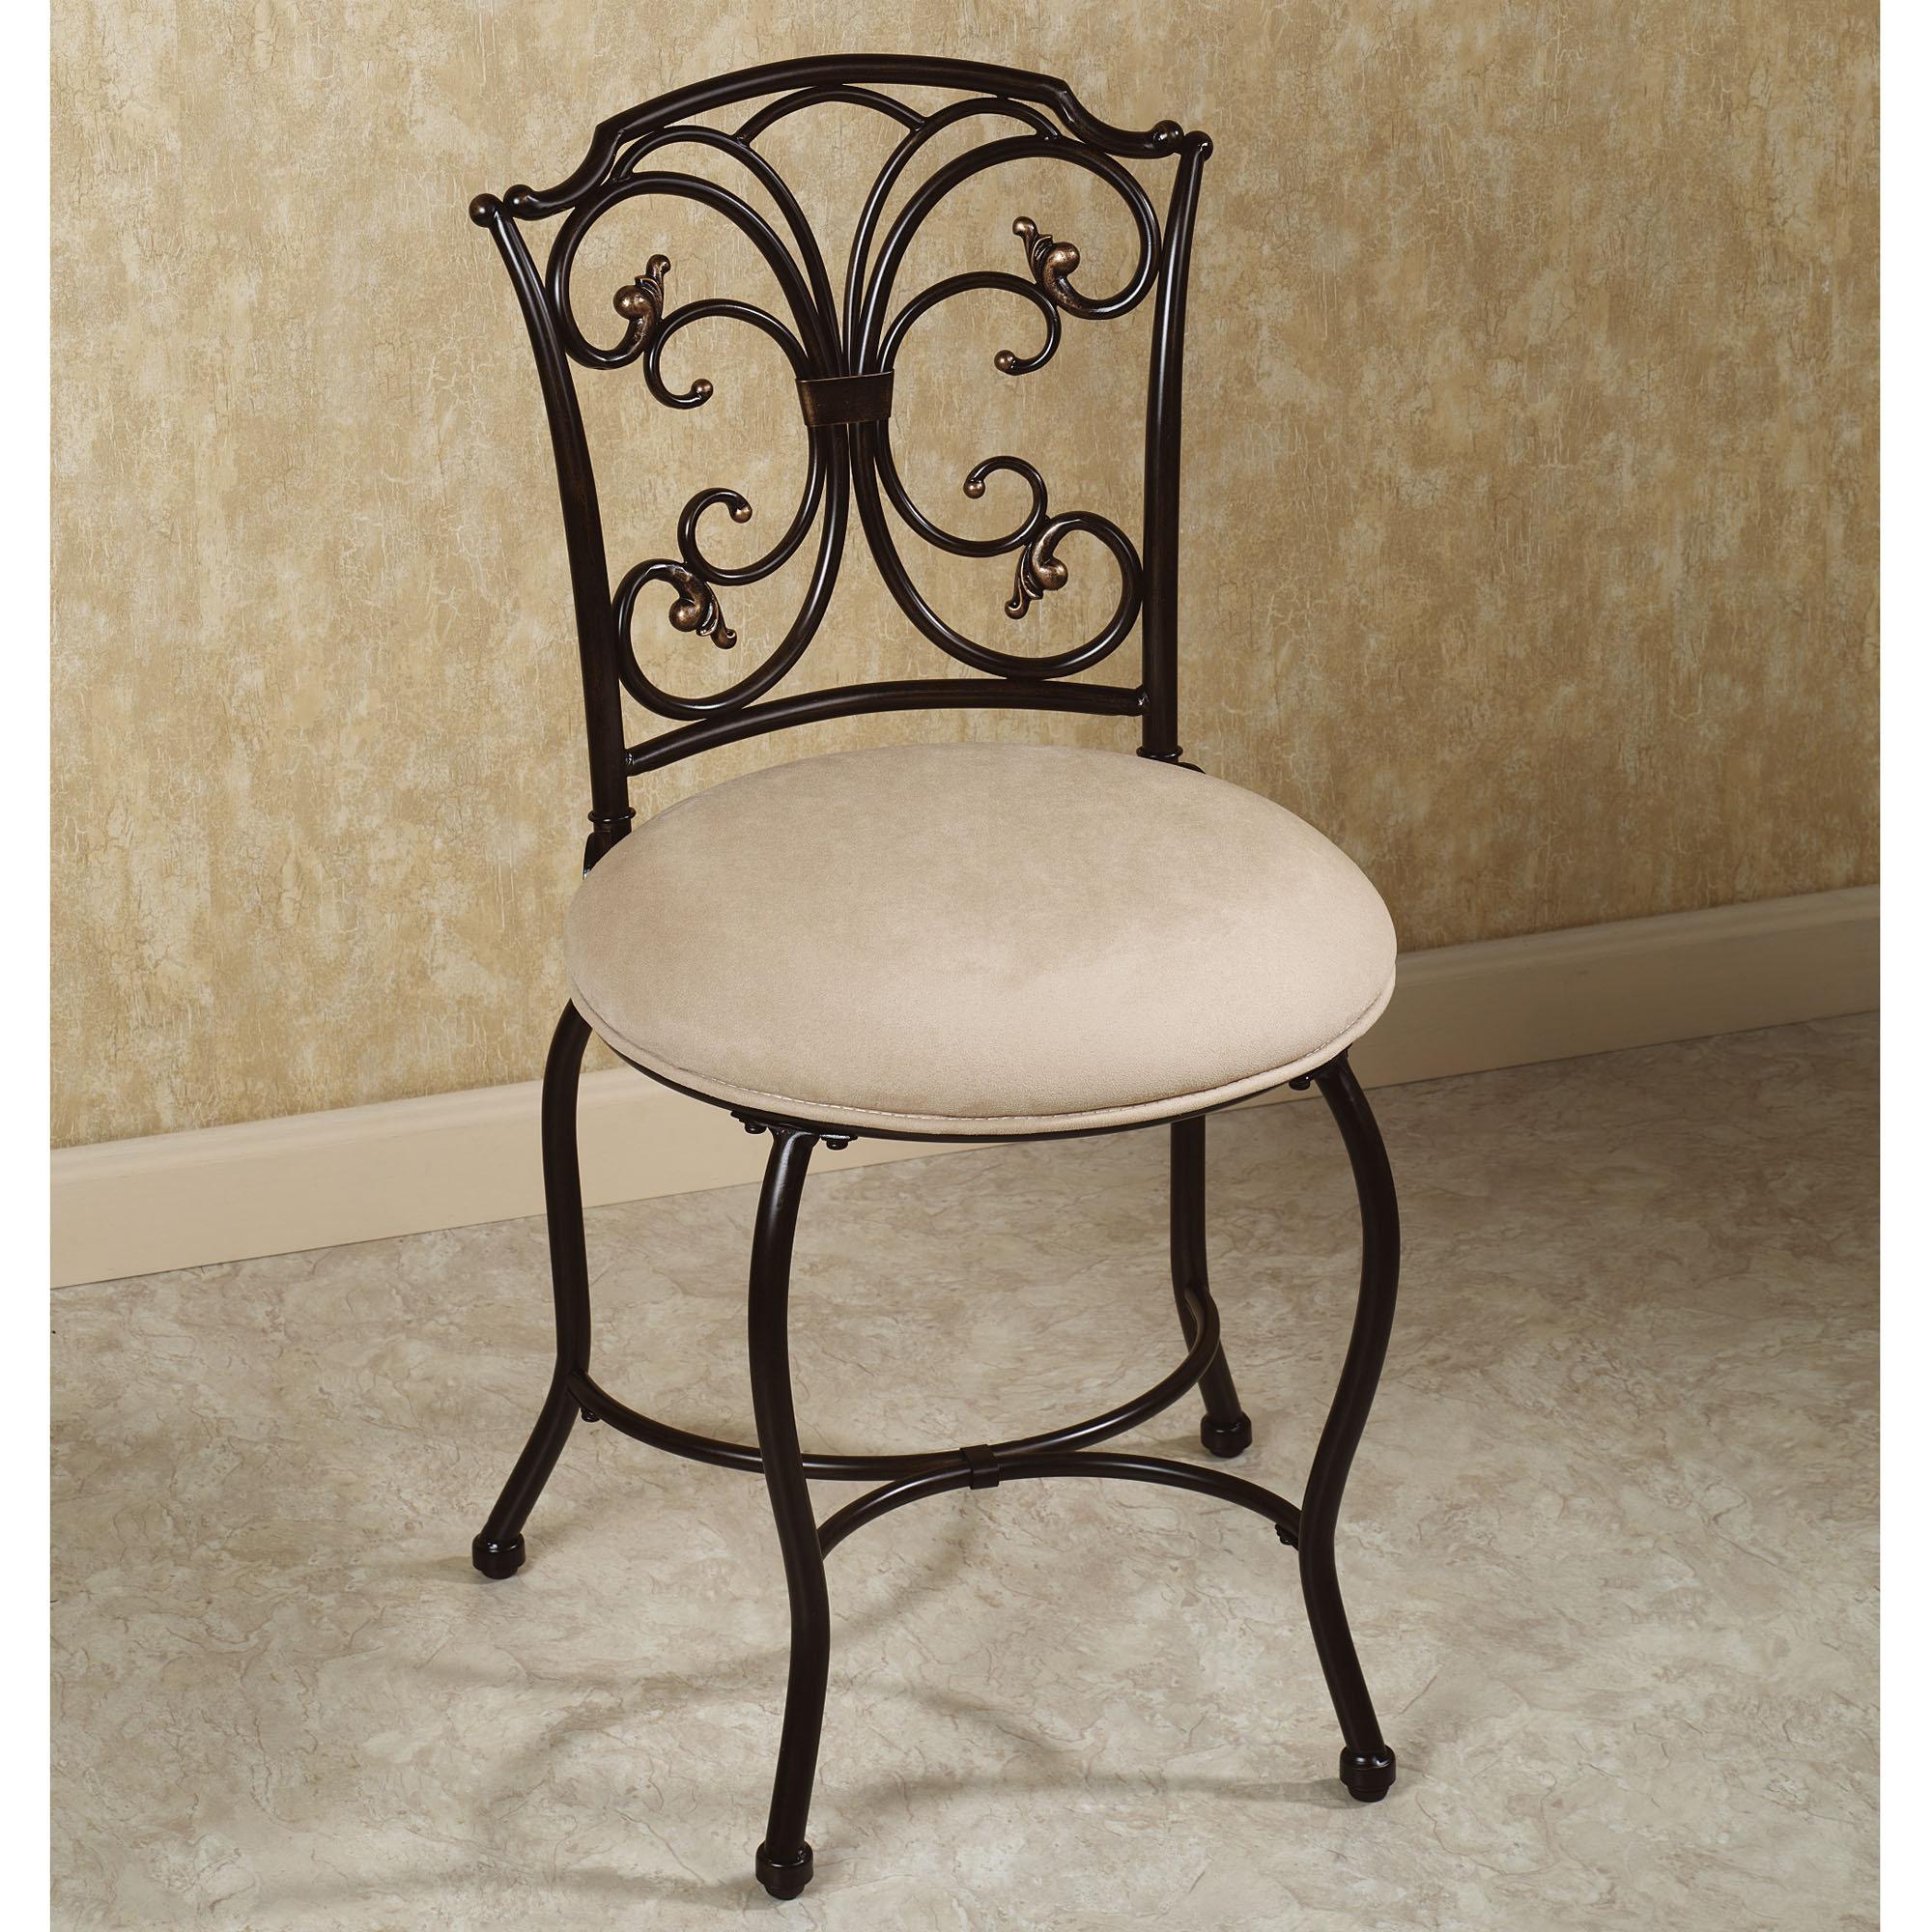 Bathroom Popular Design Furniture Elegant Black Vanity Chairs For Bathroom Vanity Chair For Bathroom For Contemporary Or Classic Bathroom Design Bathroom Inspired 2016